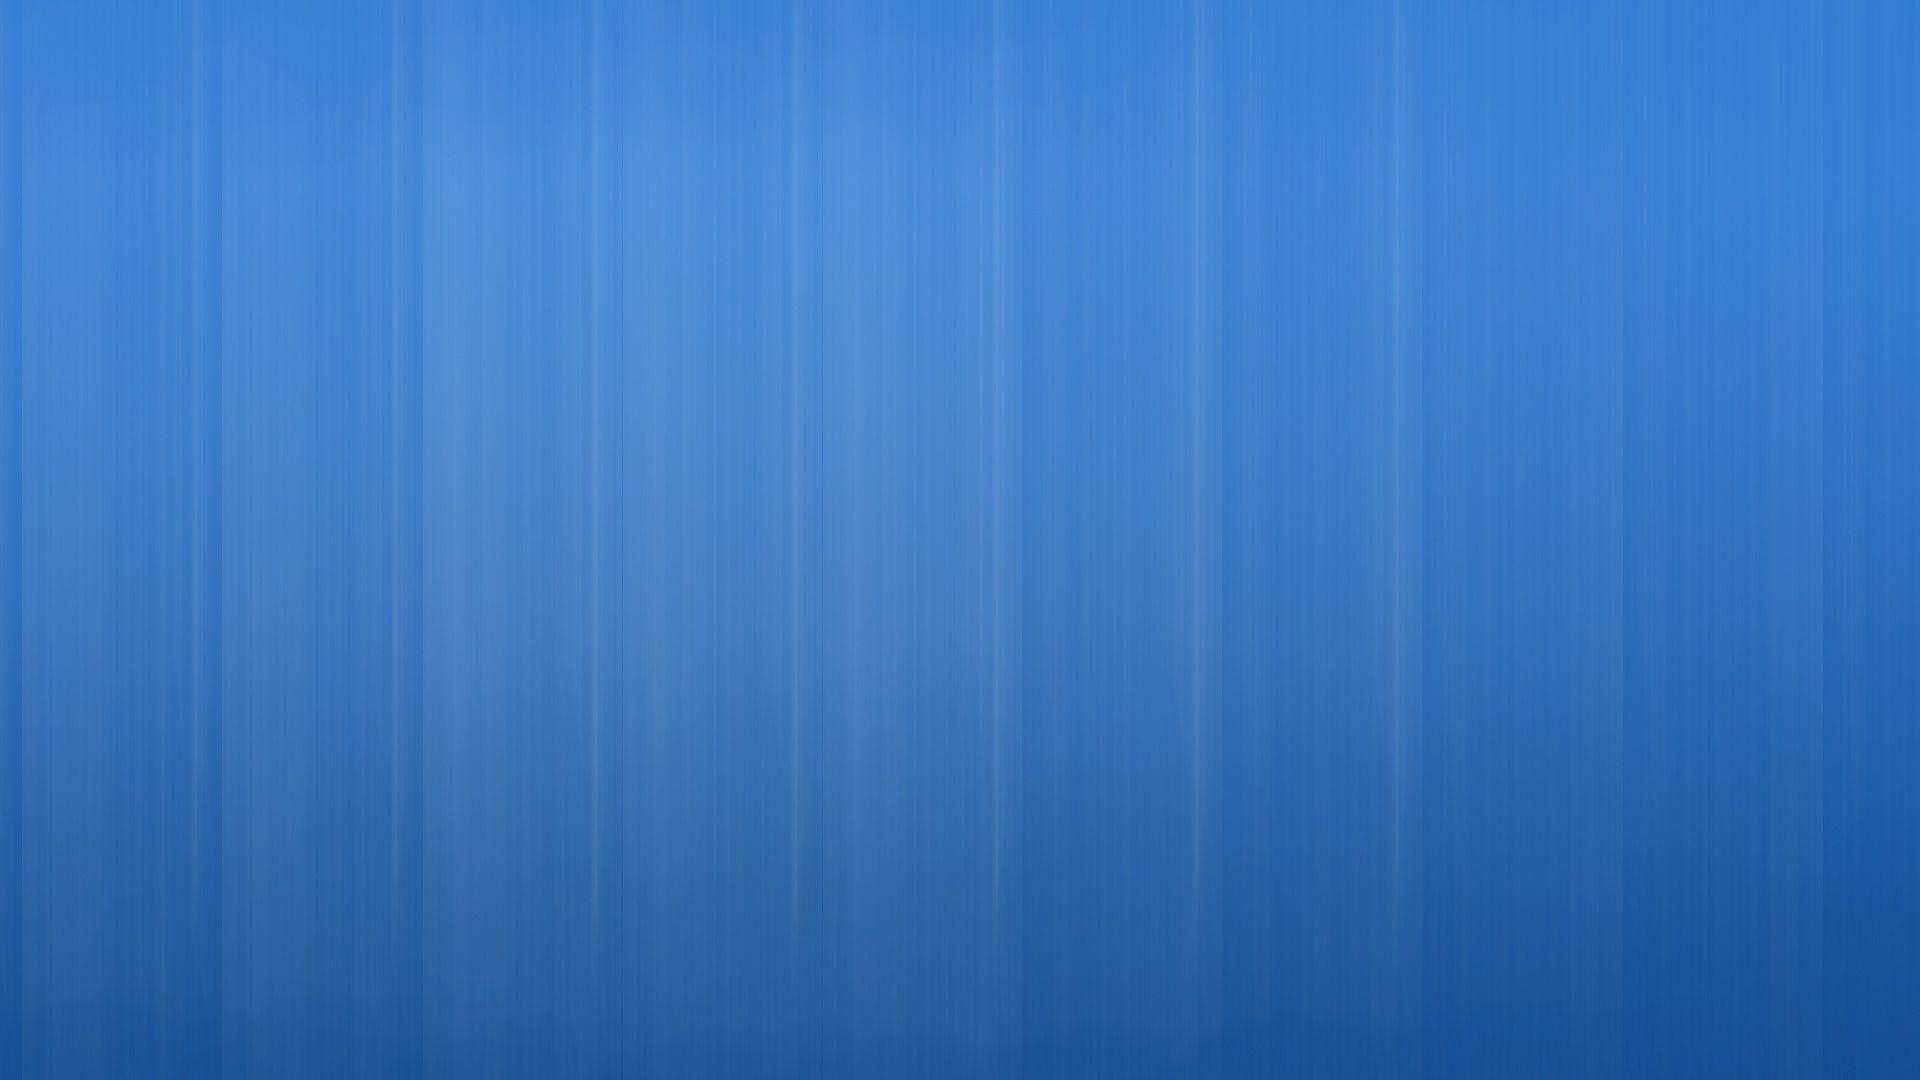 Cute Blue Image